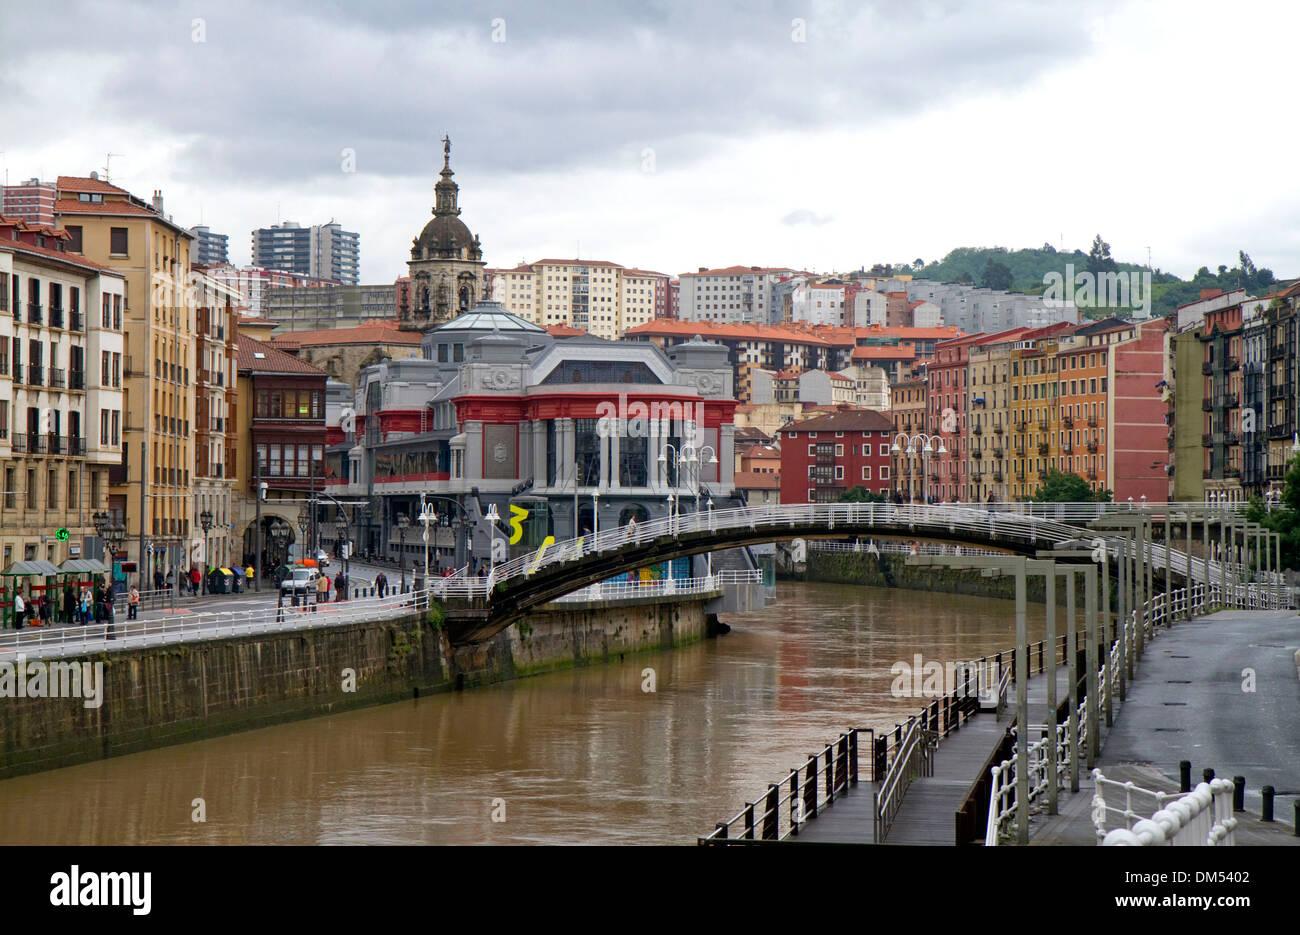 Exterior of the Mercado de la Ribera along the Nervion River at Bilbao, Biscay, Spain. - Stock Image